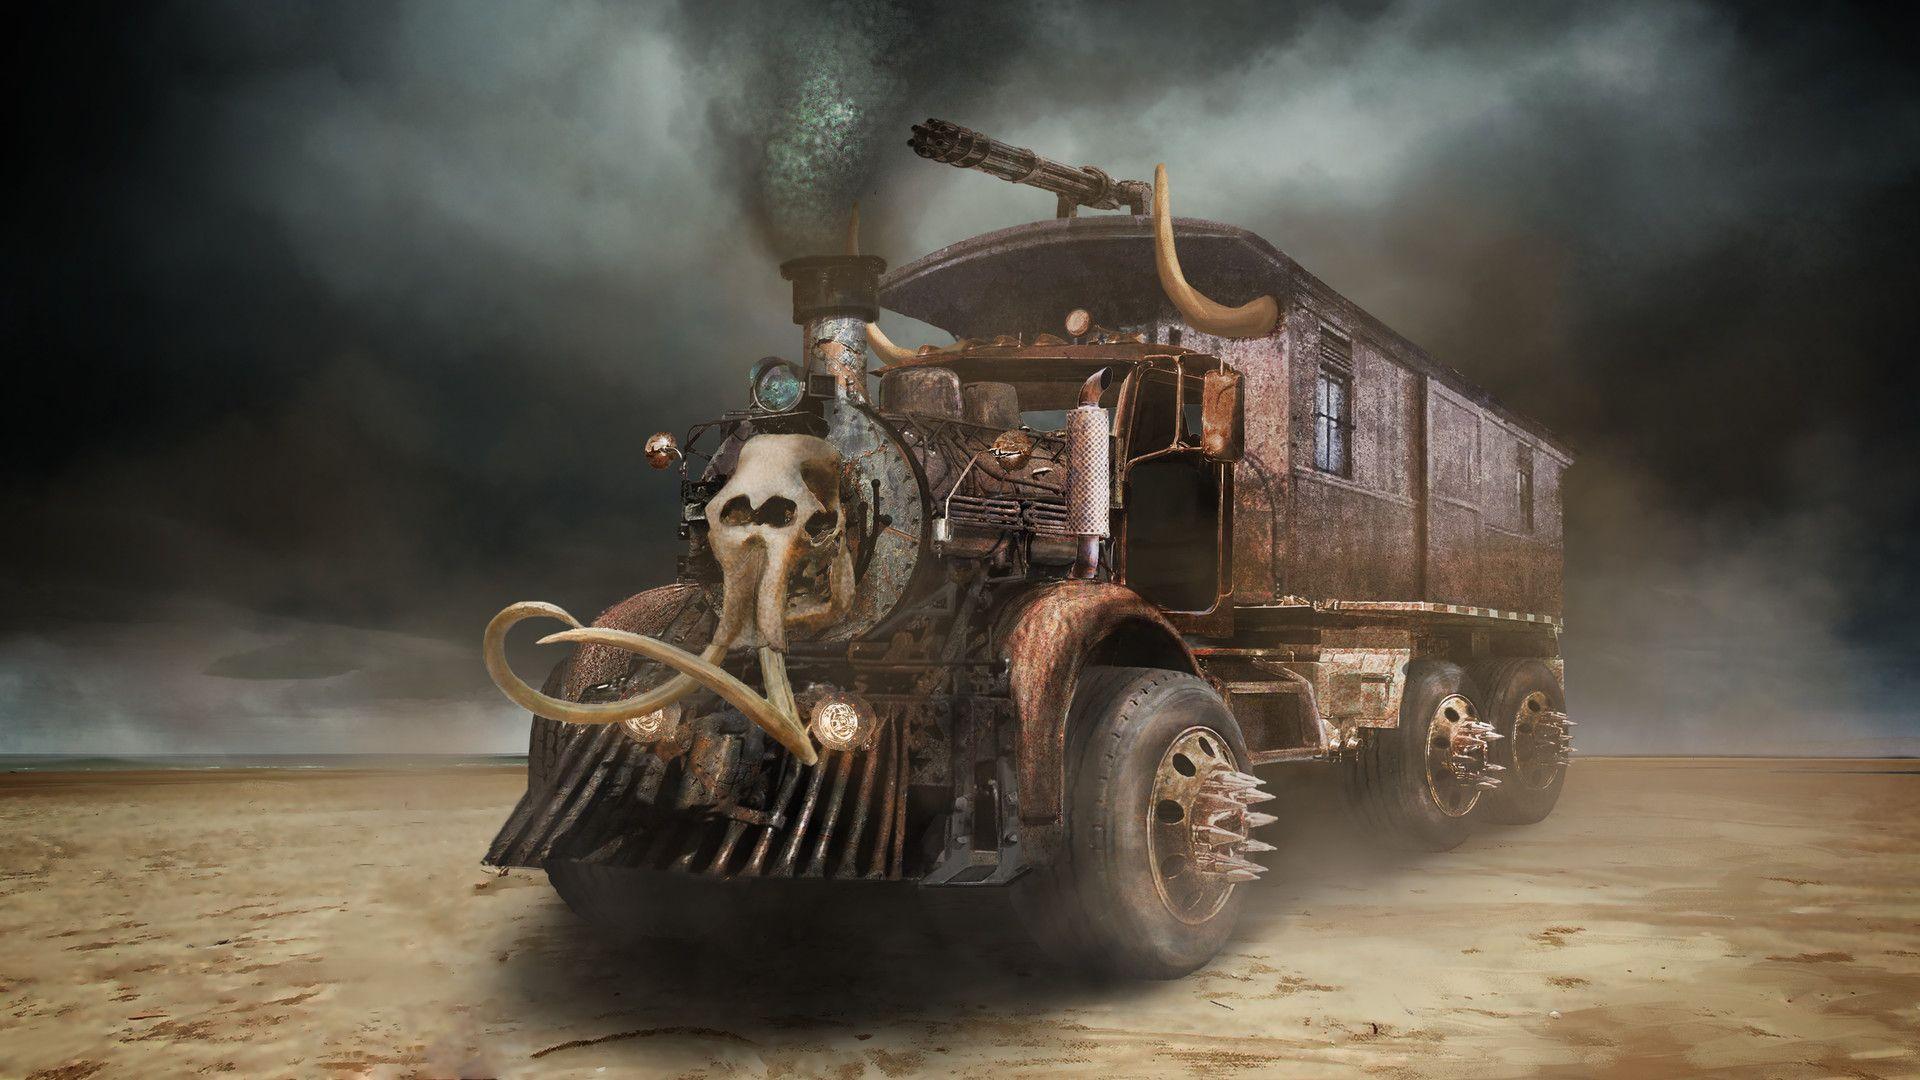 Warcraft Mad Max Hybrid Truck By Grace W Hybrid Trucks Psychedelic Illustration Fantasy Artist